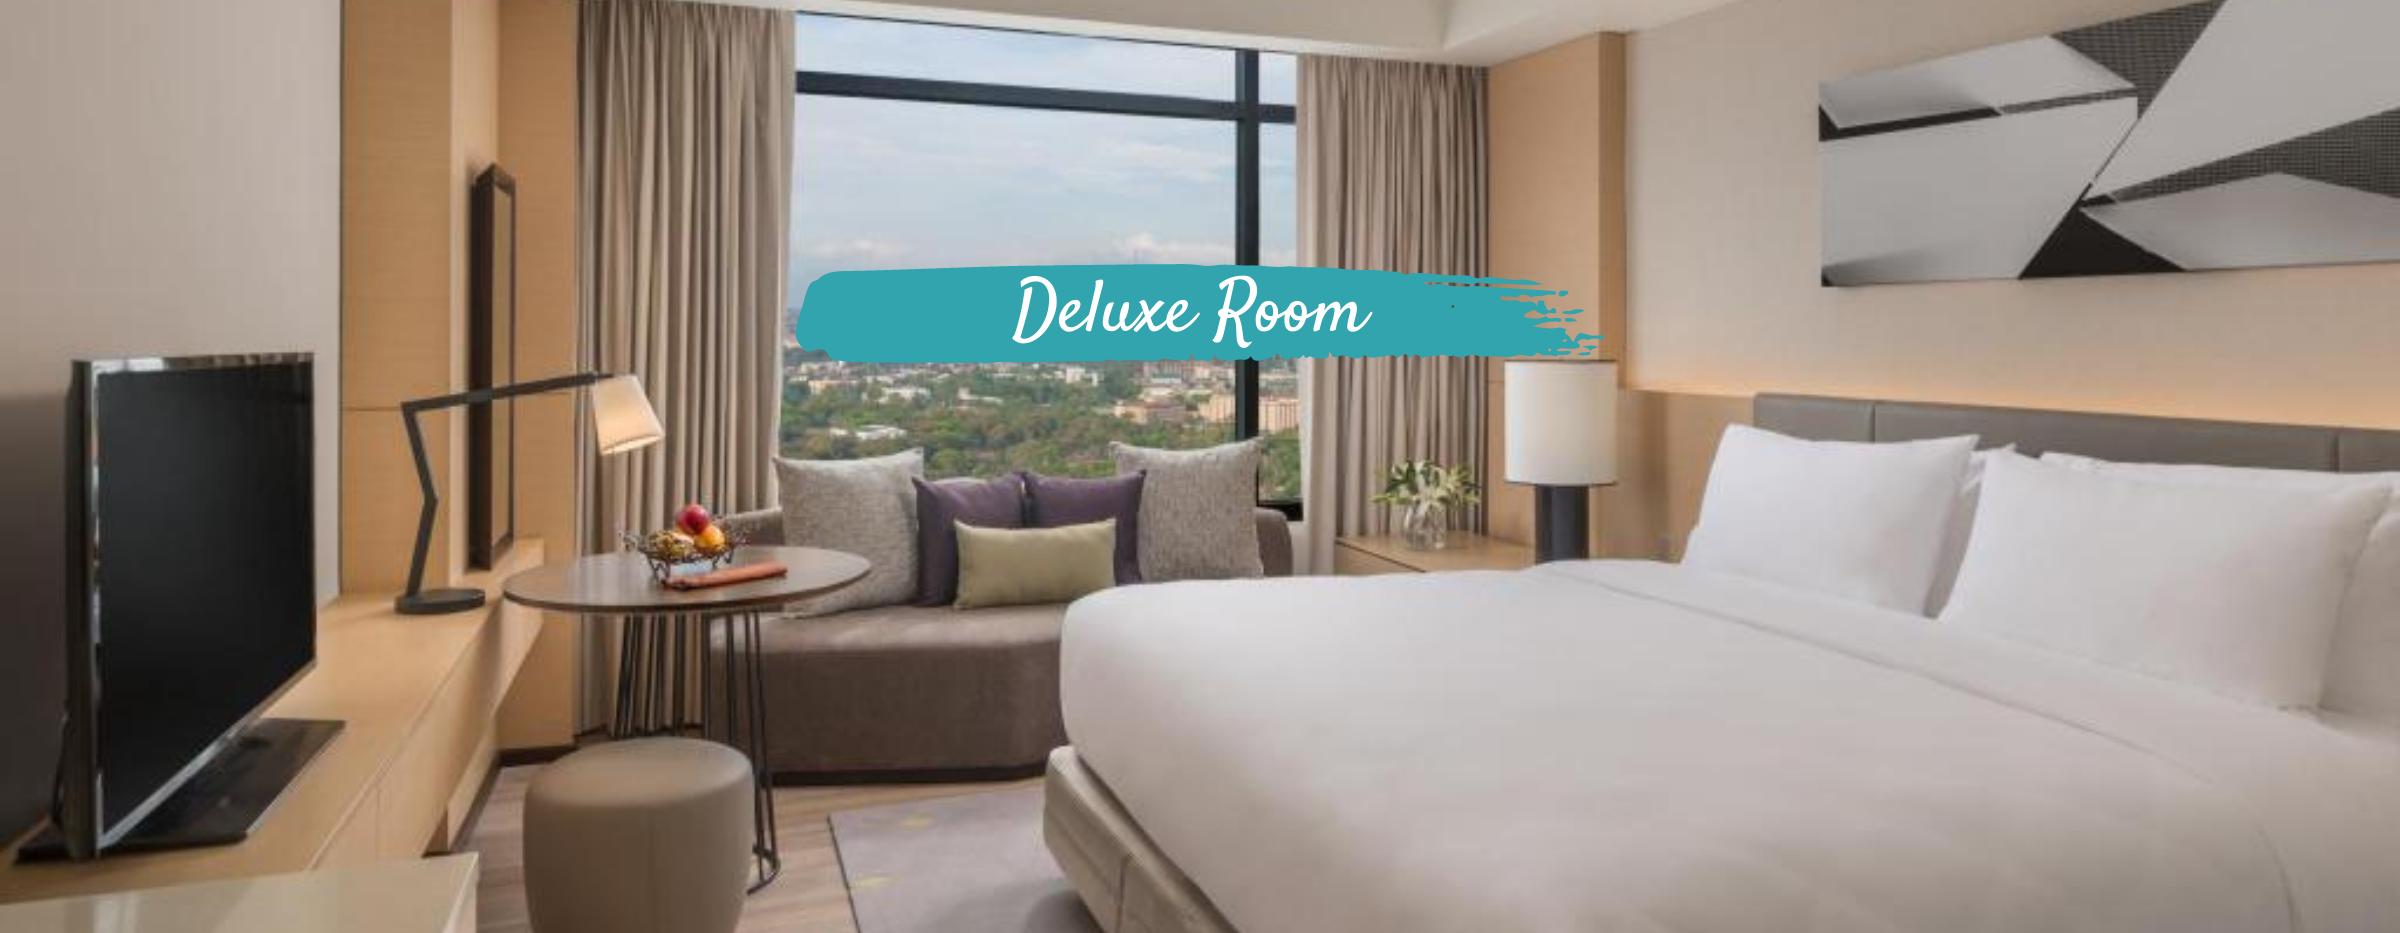 Seda Vertis North Hotel Deluxe Room   LAX to MNL Philippine Airlines + Manila Hotel Quarantine Package